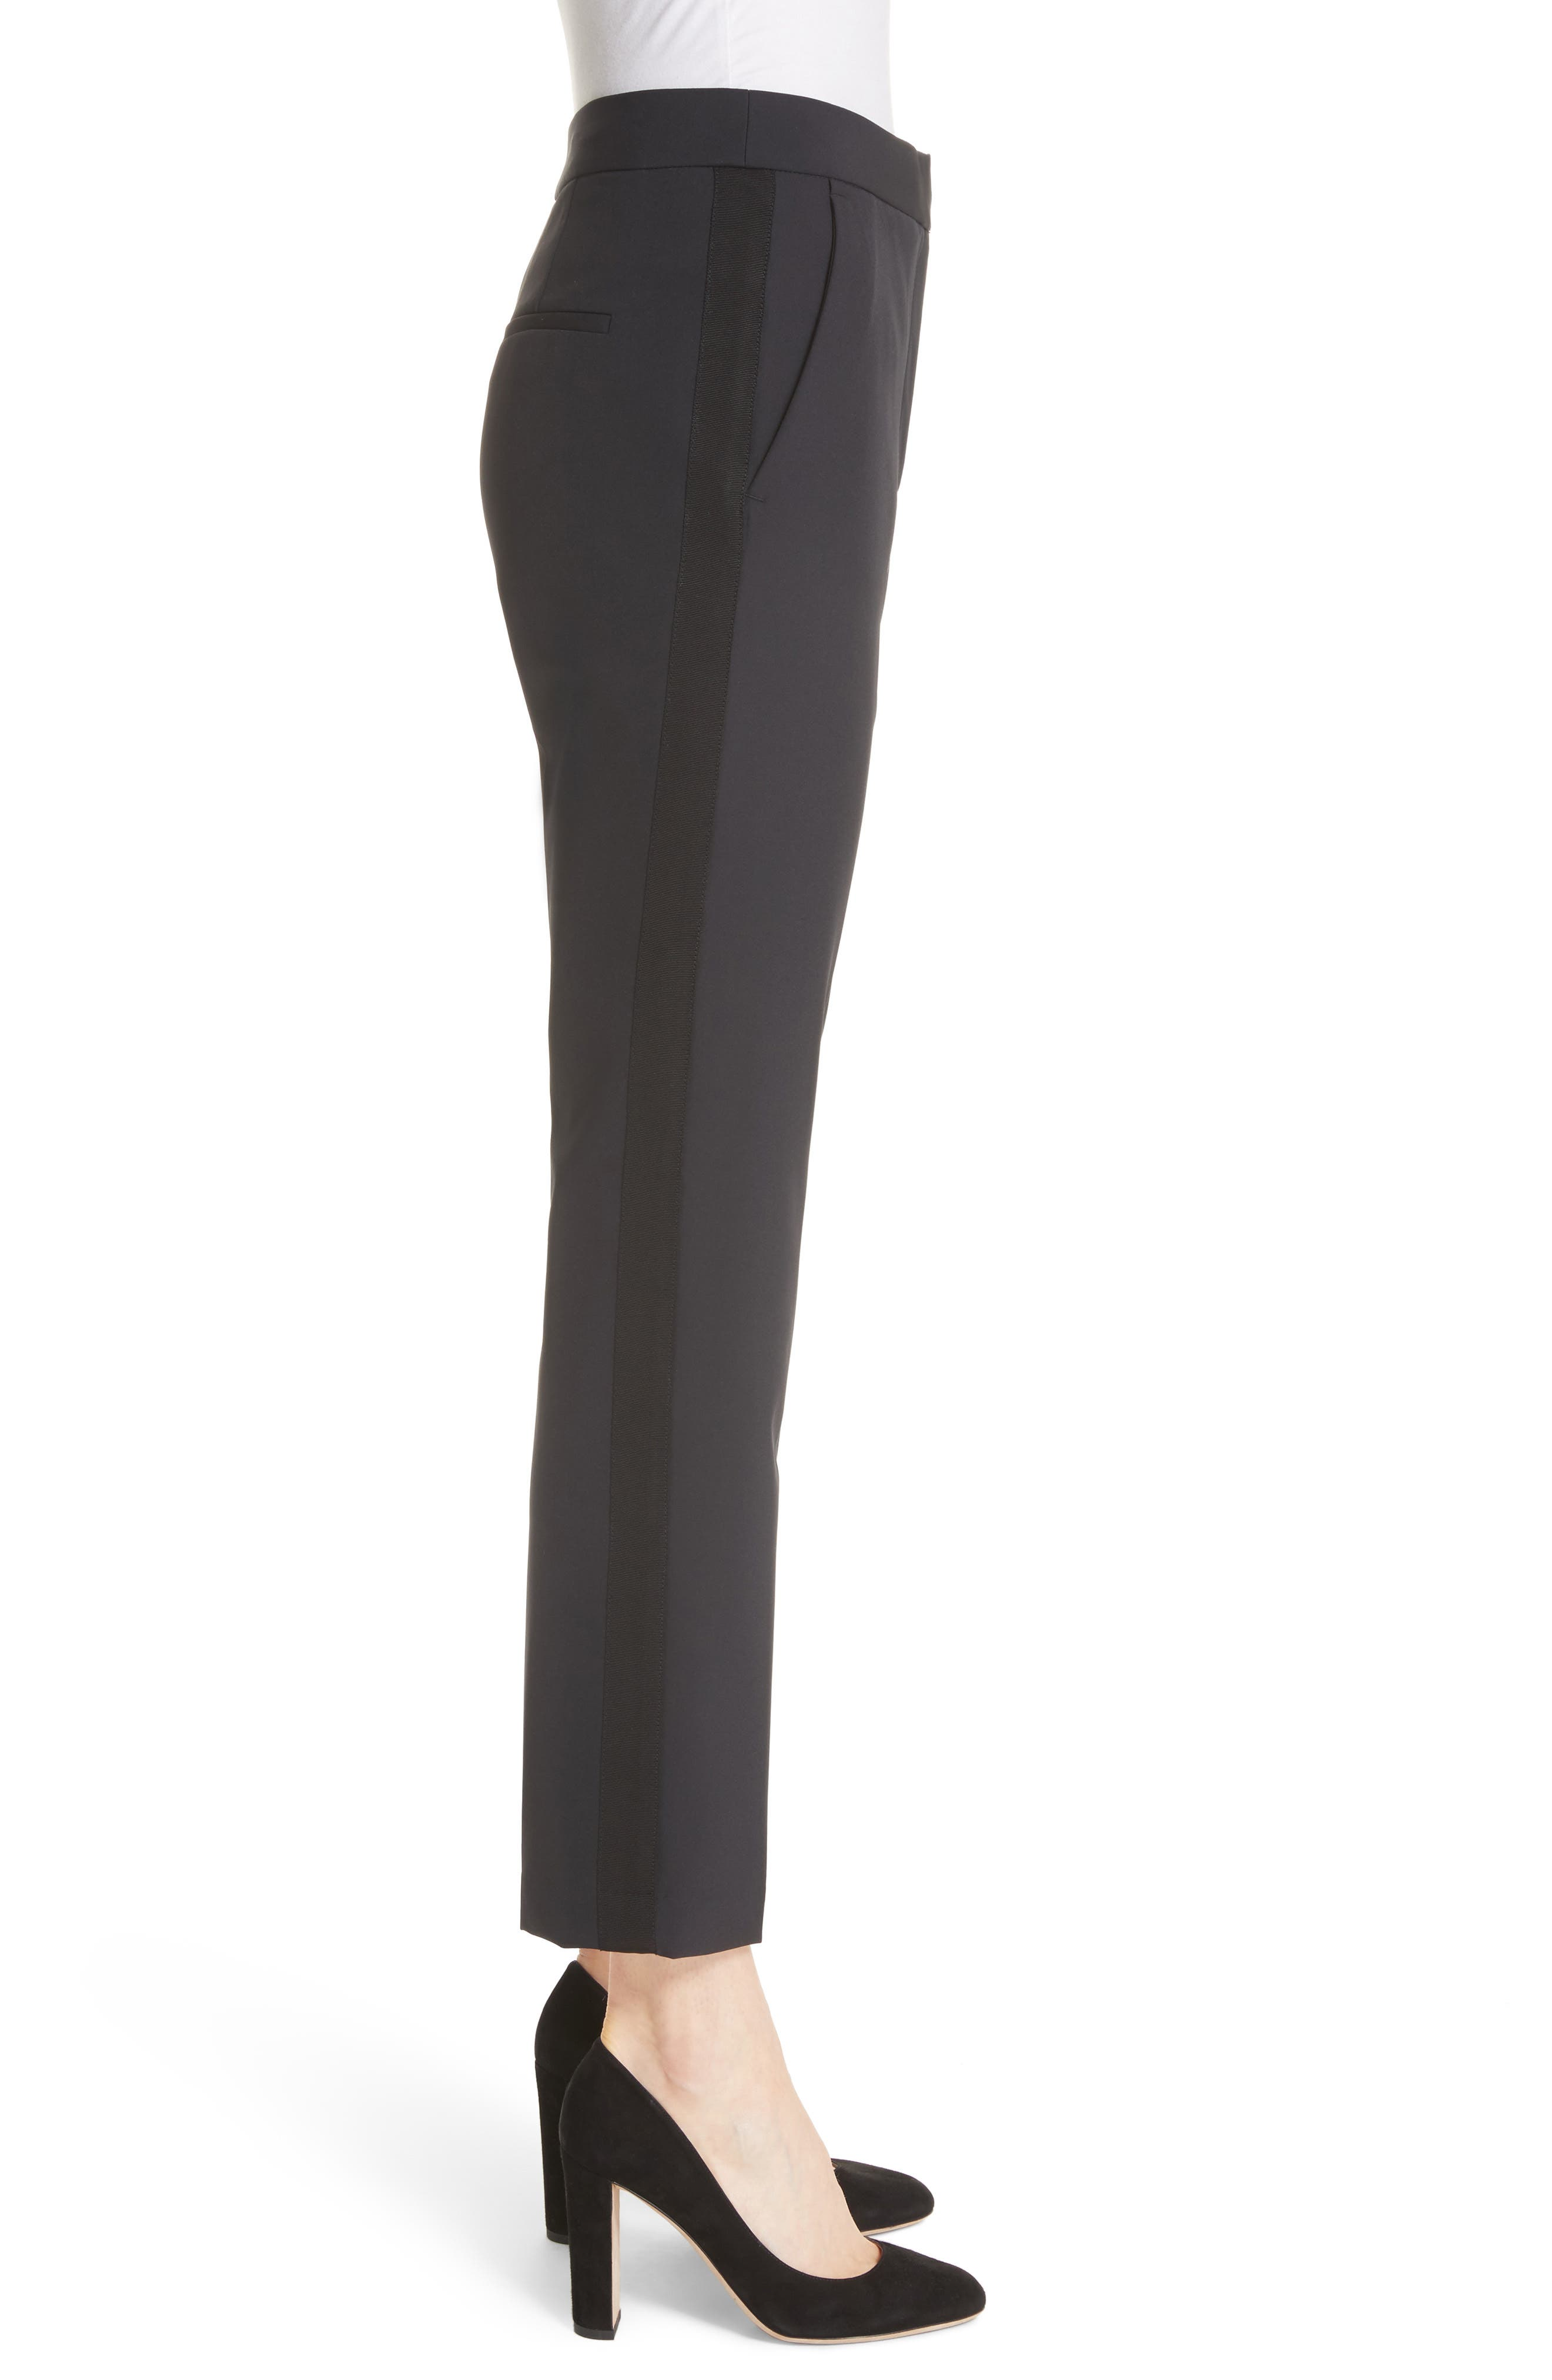 REBECCA TAYLOR, Audra Crop Pants, Alternate thumbnail 4, color, BLACK